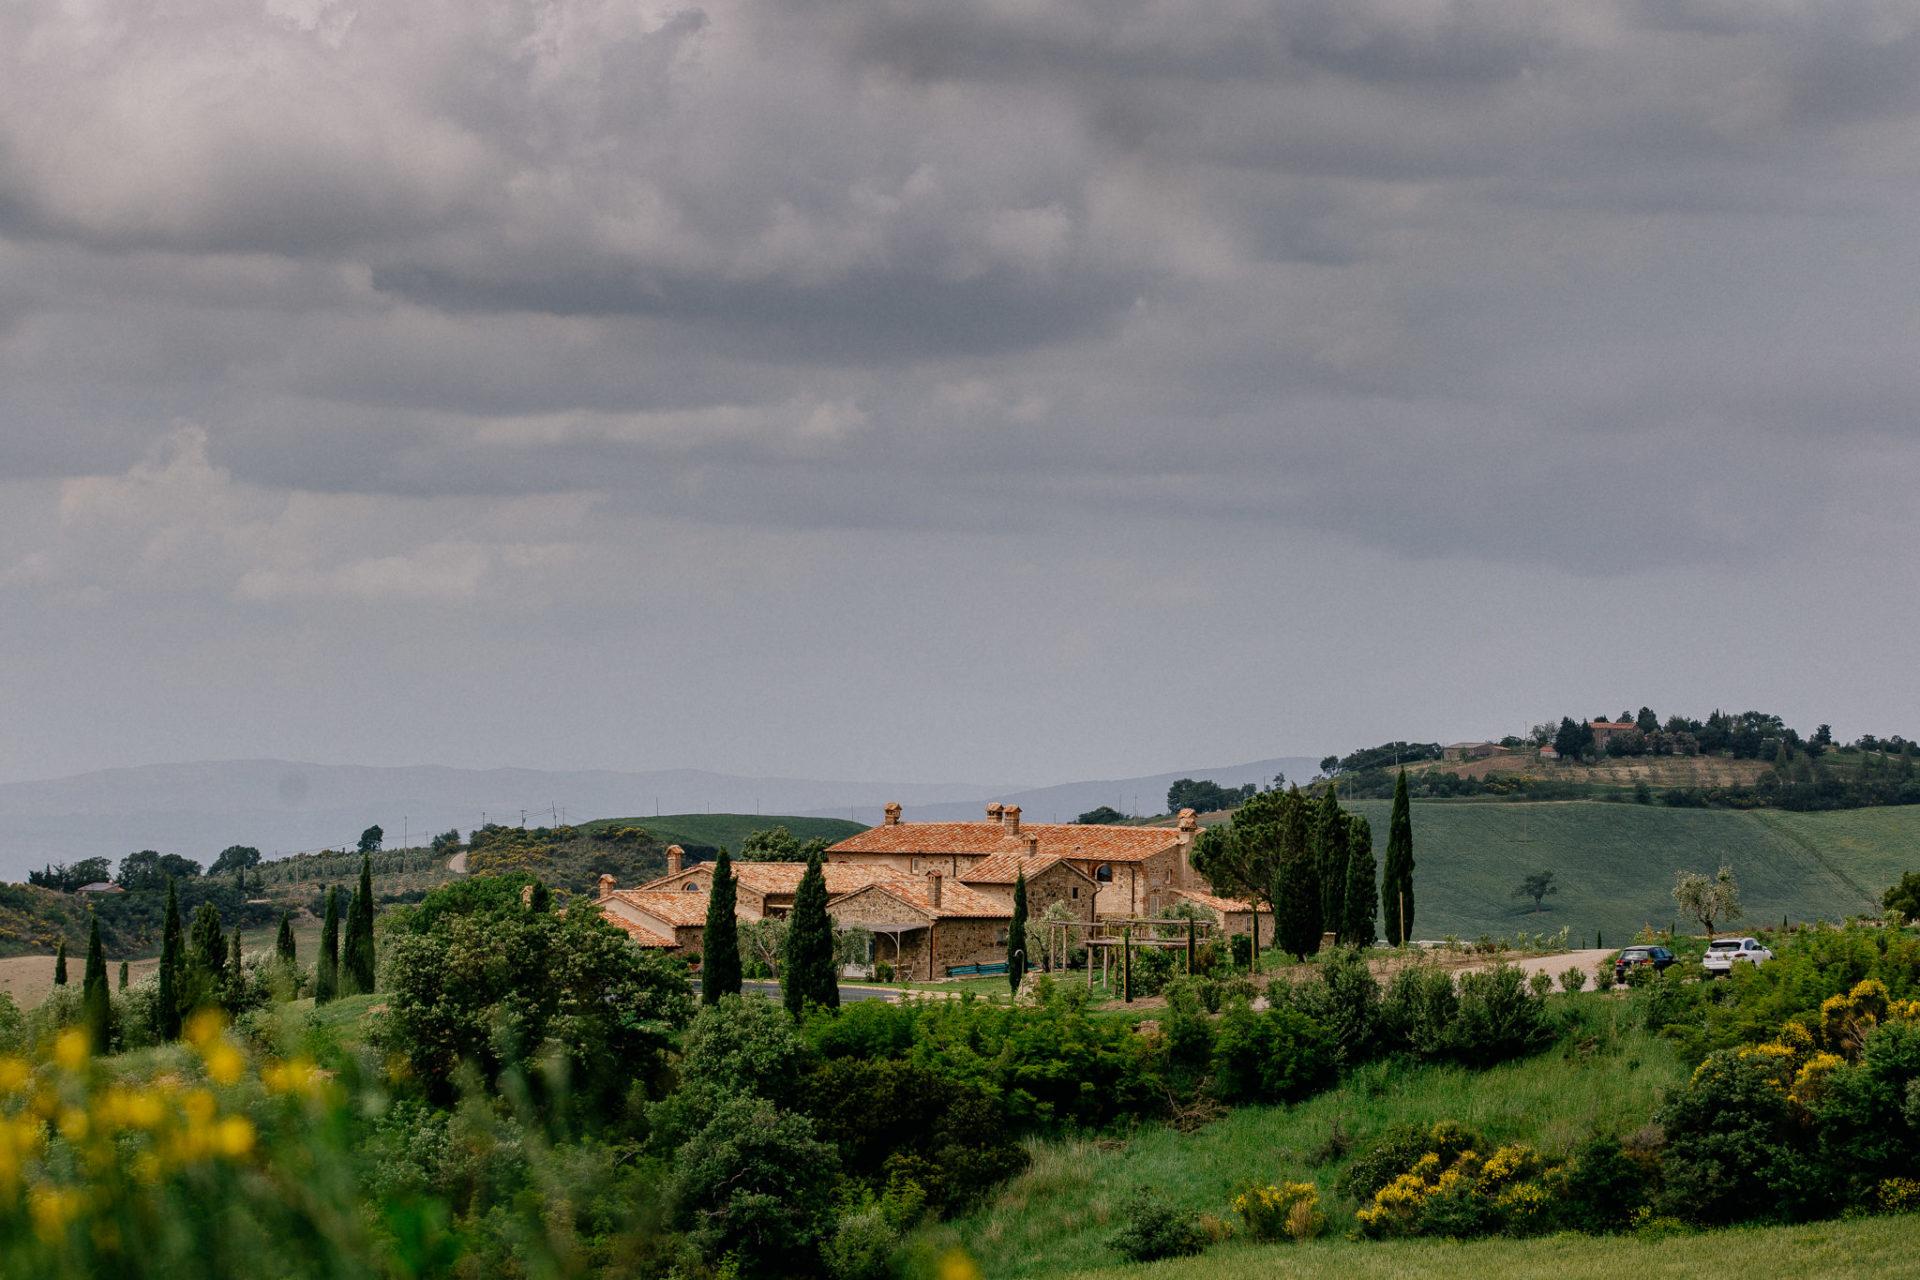 heiraten Toskana-hochzeitsfotograf toskana-italien roadtrip-europa entdecken-dimora santa margherita-boutique hotel-individuell feiern